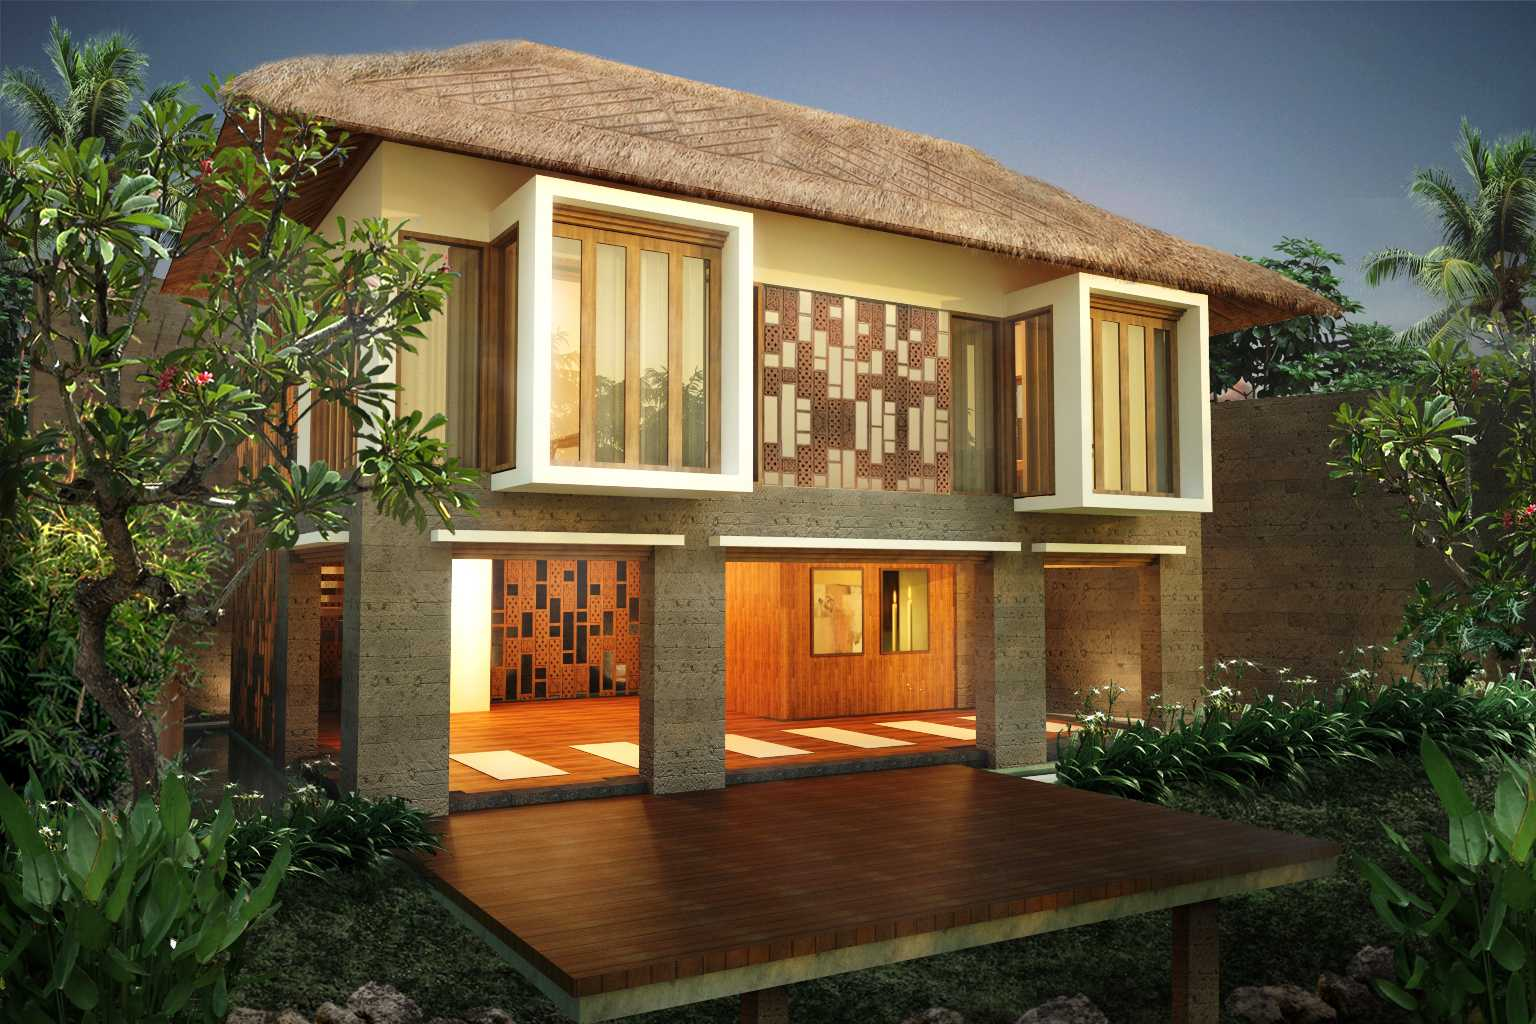 Made Dharmendra Architect Tunon Resort Ubud, Kabupaten Gianyar, Bali, Indonesia Ubud, Kabupaten Gianyar, Bali, Indonesia Exterior View Kontemporer  49354